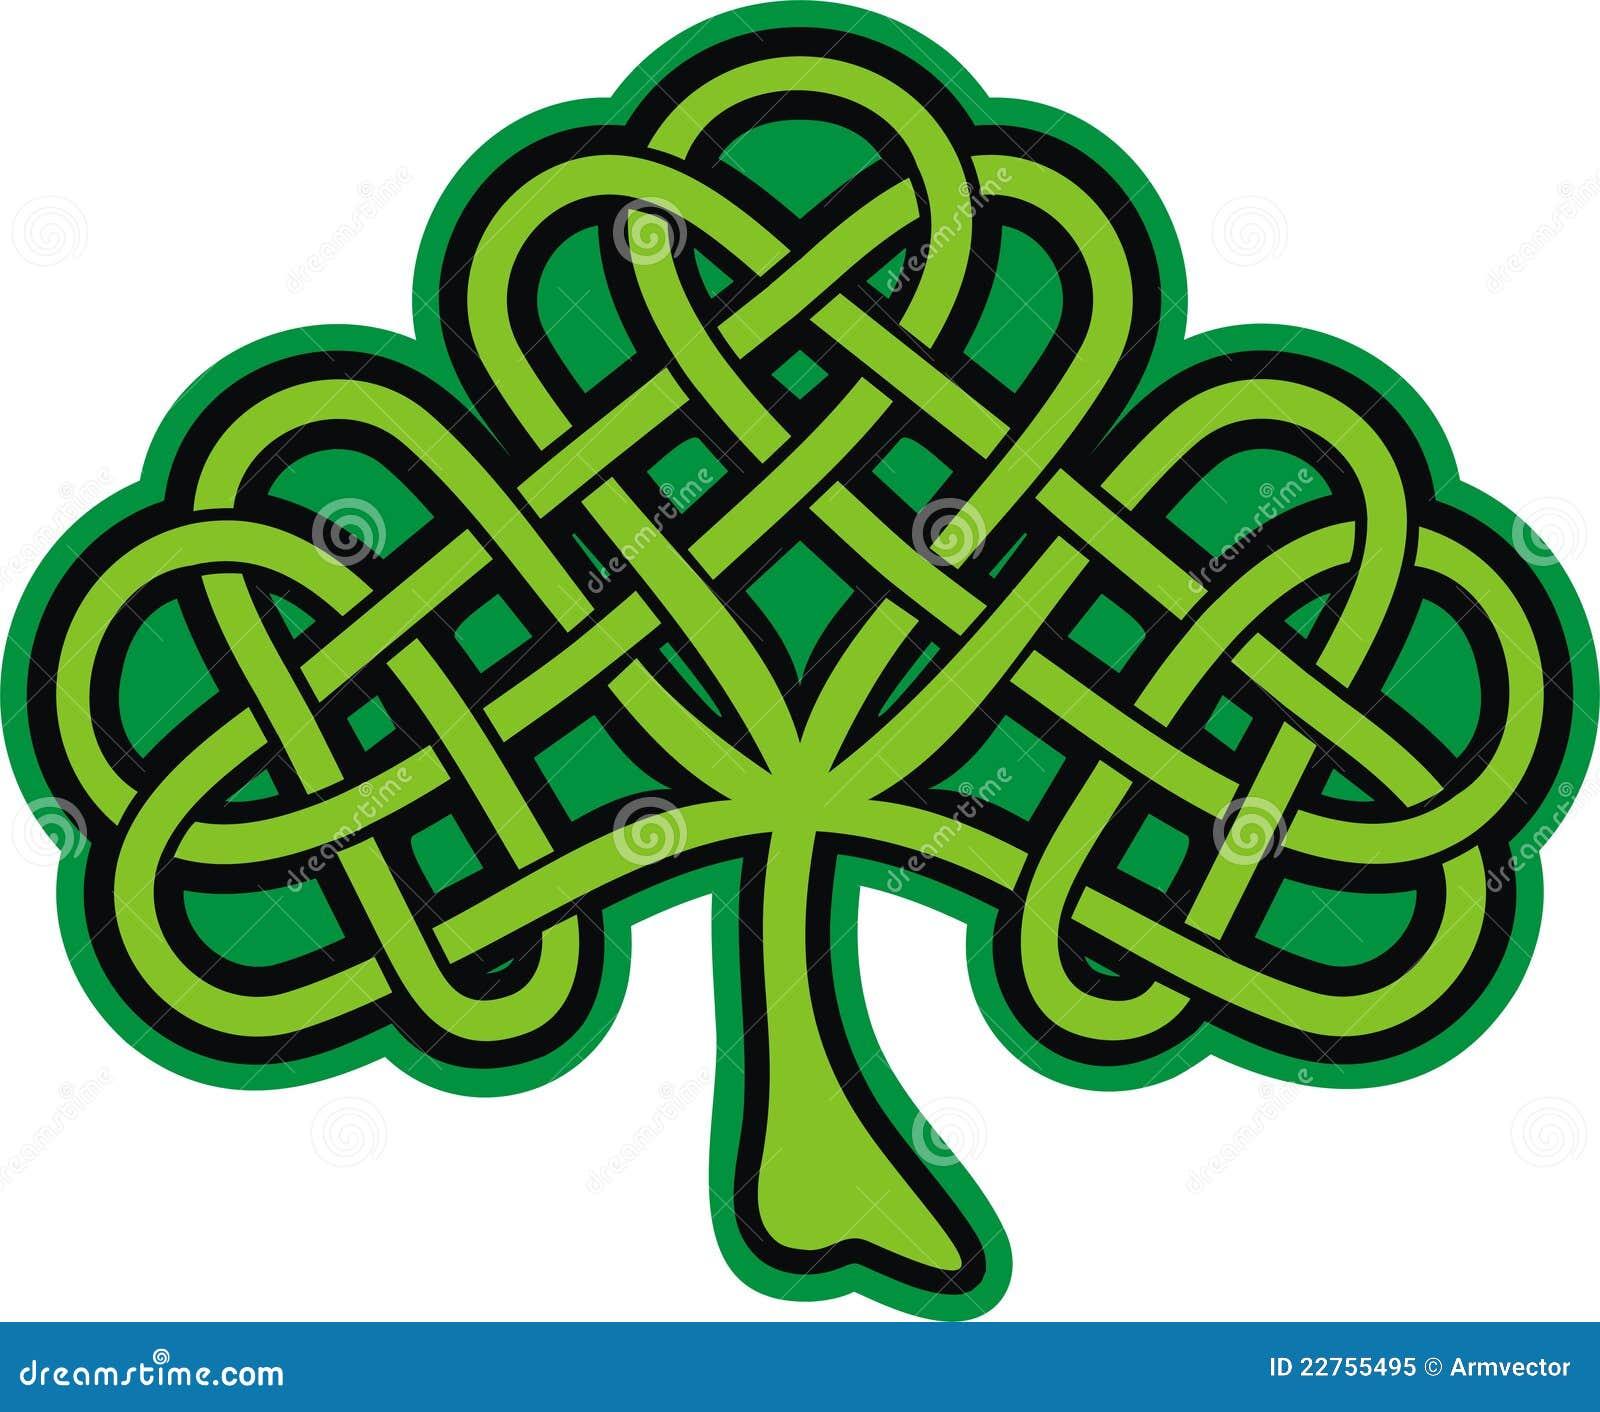 Celtic Cross With Shamrock Shamrock. ornate celtic tattoo